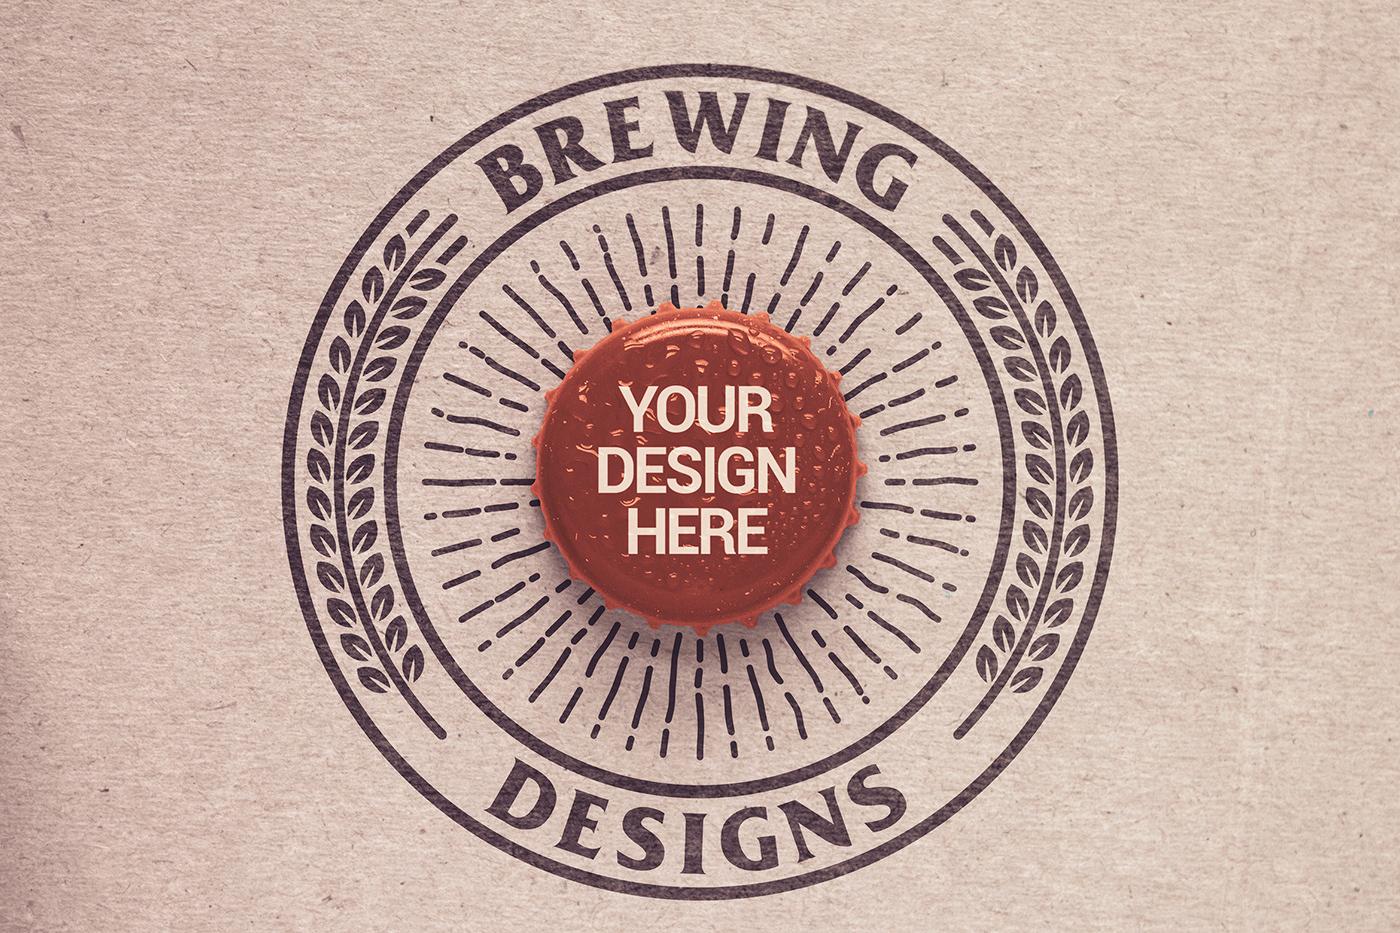 beer bottle cap craft logo malt Mockup paper paperboard top view